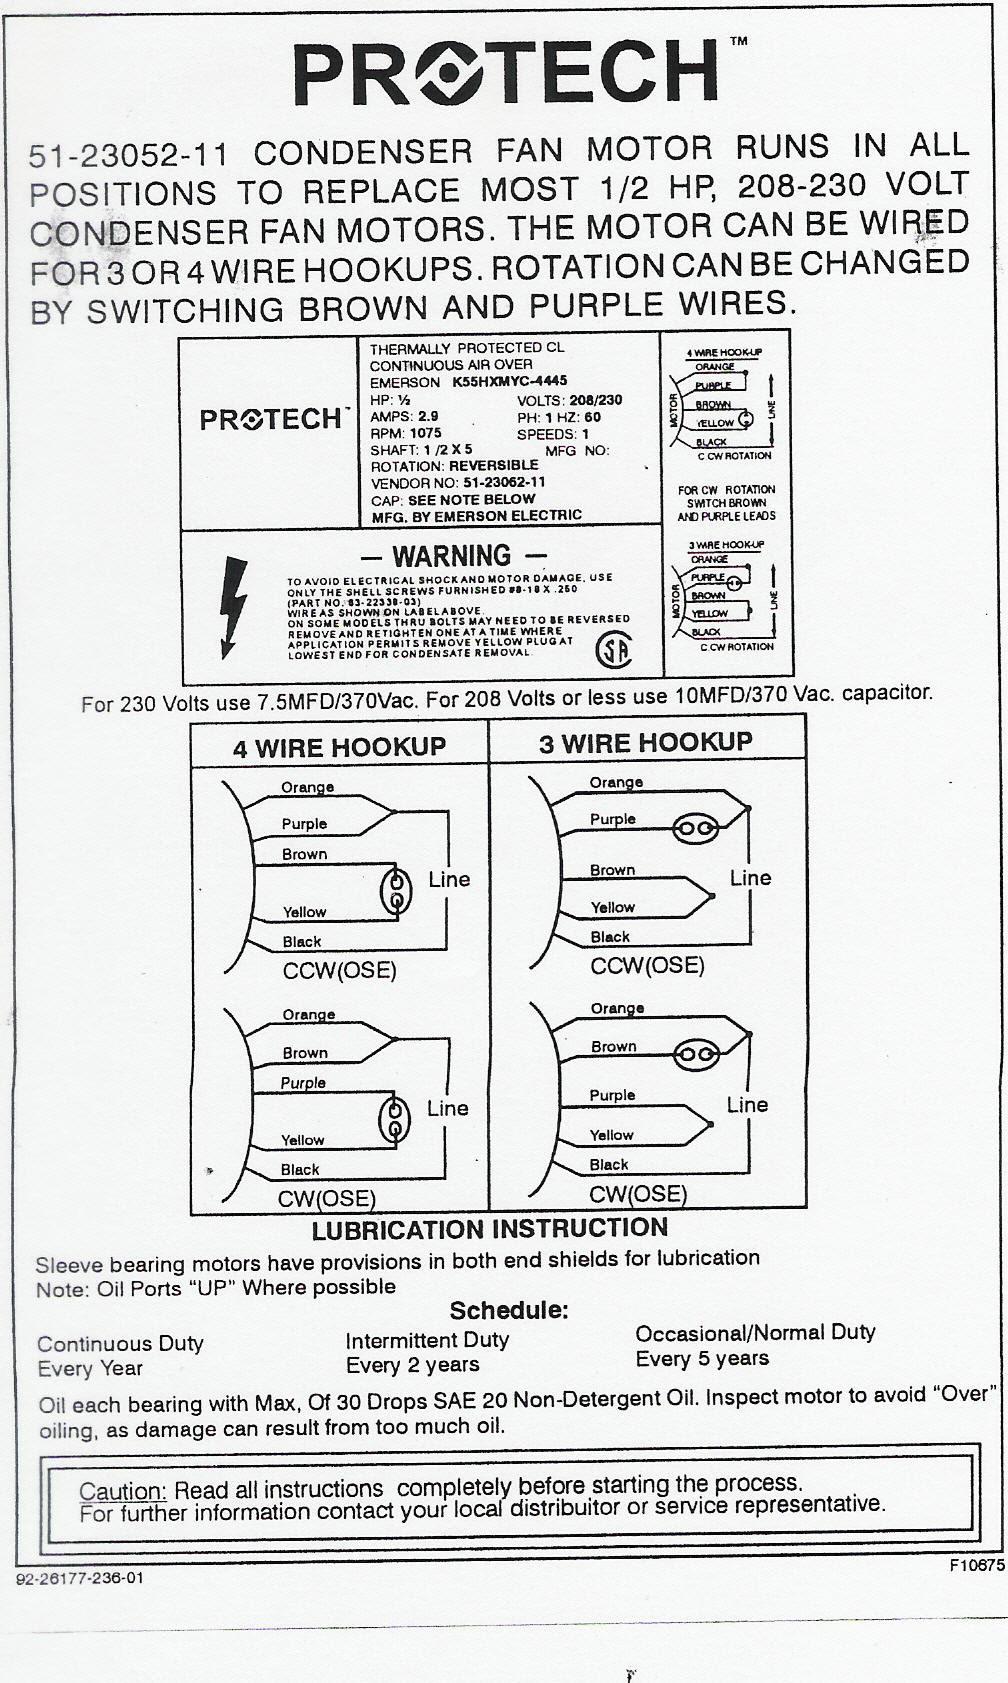 Rheem Heat Pump Wiring Diagram : rheem, wiring, diagram, Wiring, Diagram